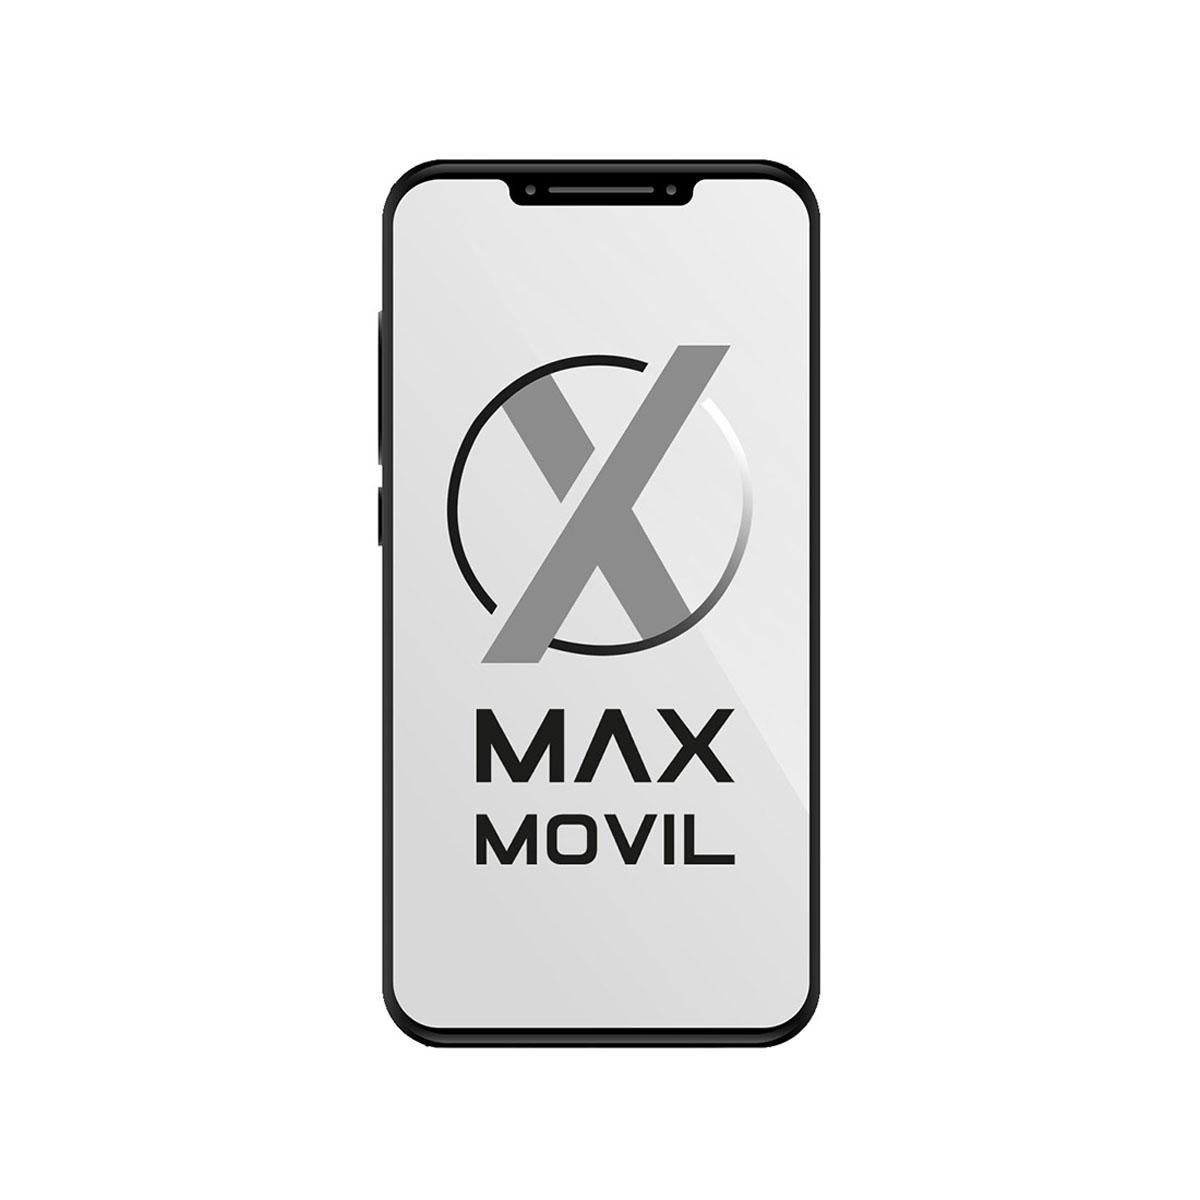 TCL PLEX 6GB/128GB Blanco Ópalo (Opal White) Dual SIM T780H